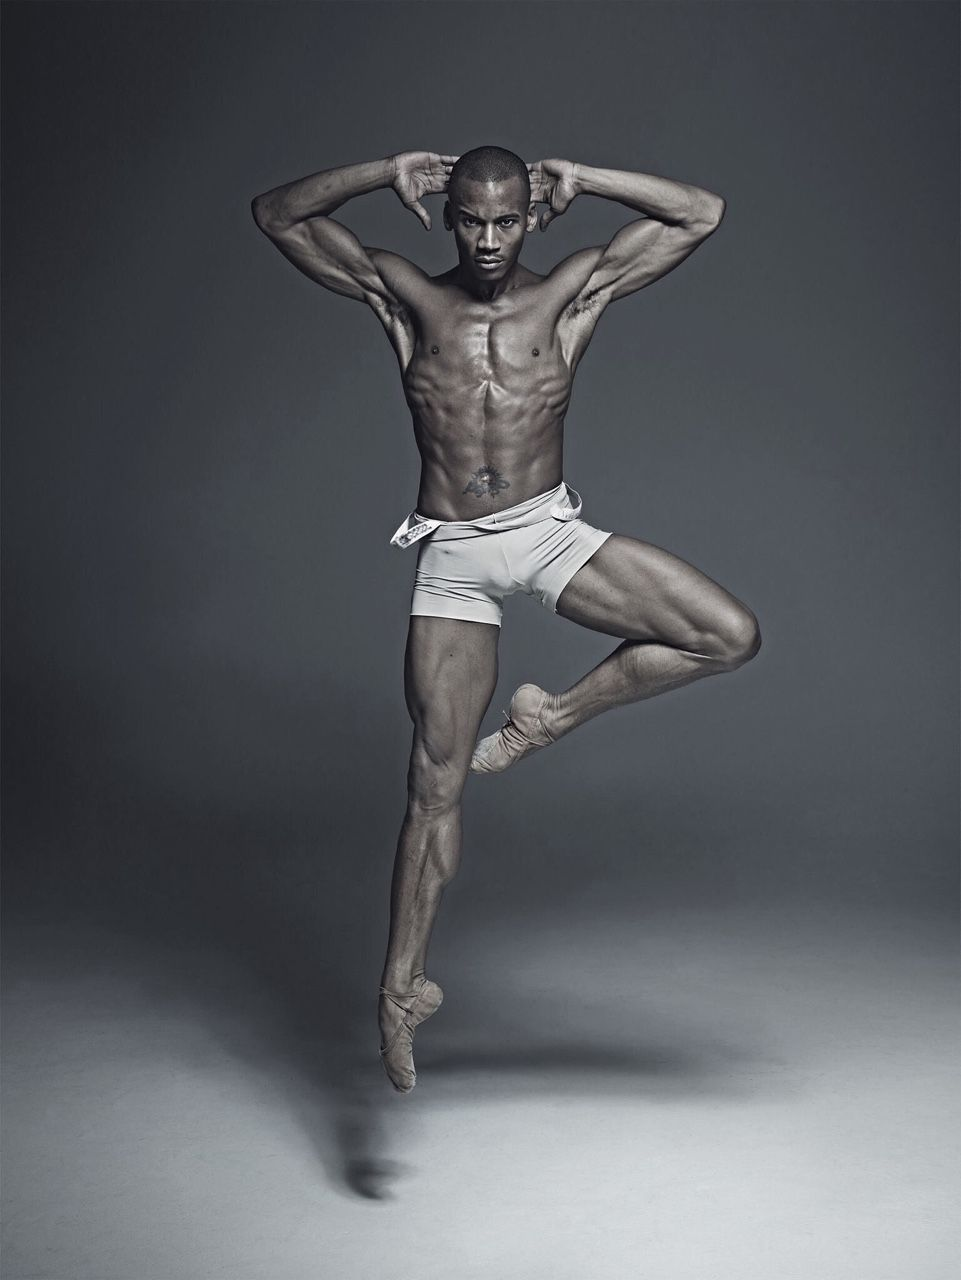 male dancer | Tumblr | Dance | Pinterest | Dancers, Royal ...